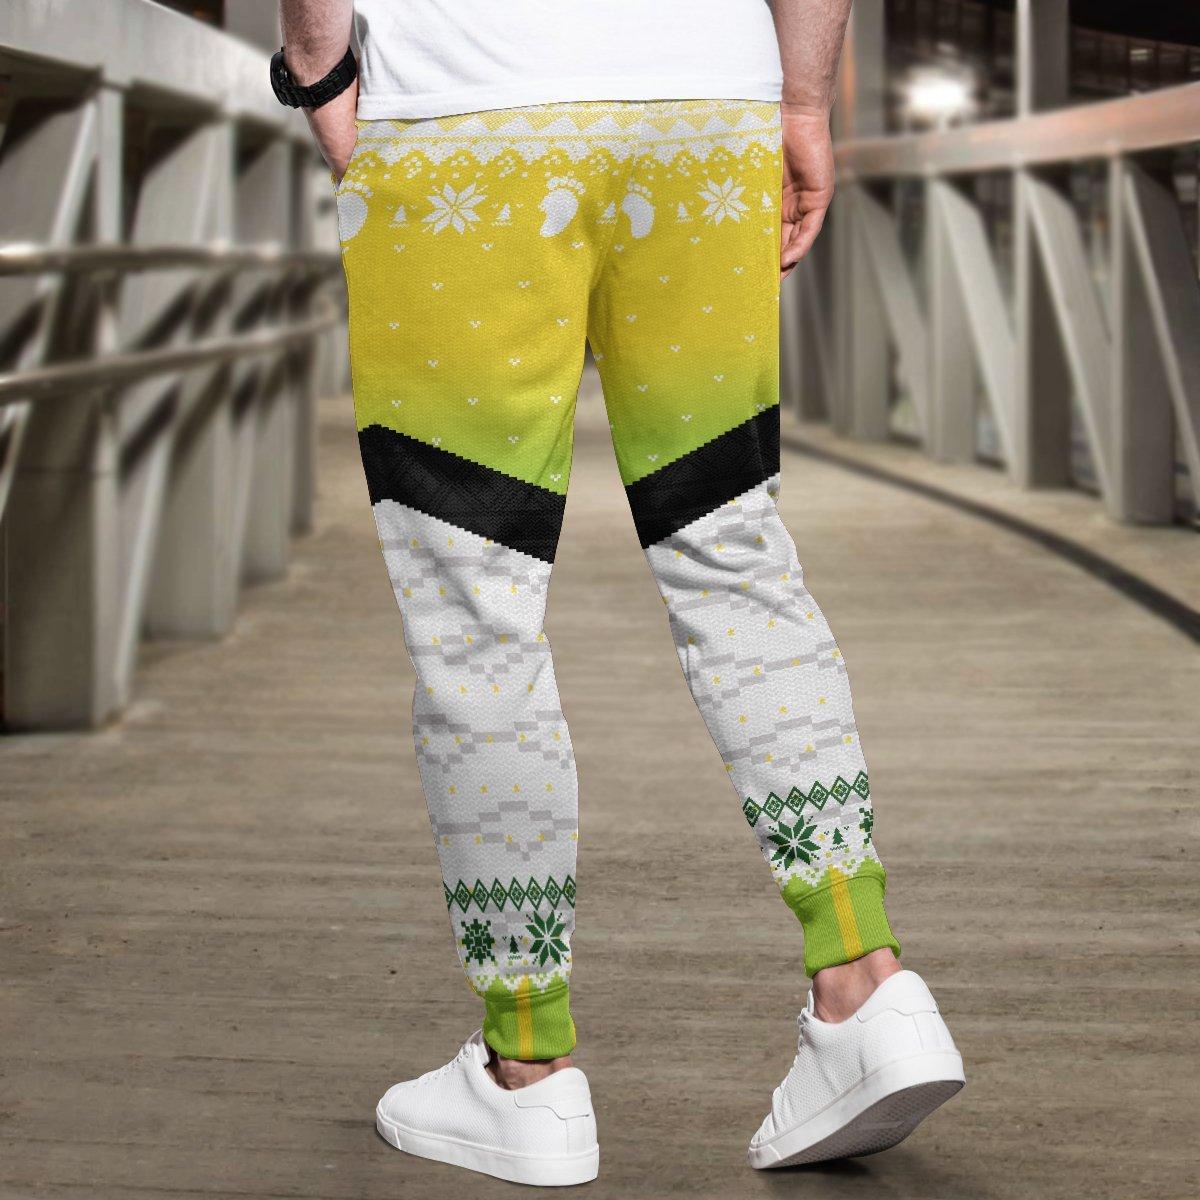 team itachiyama christmas jogger pants 837471 - Otaku Treat